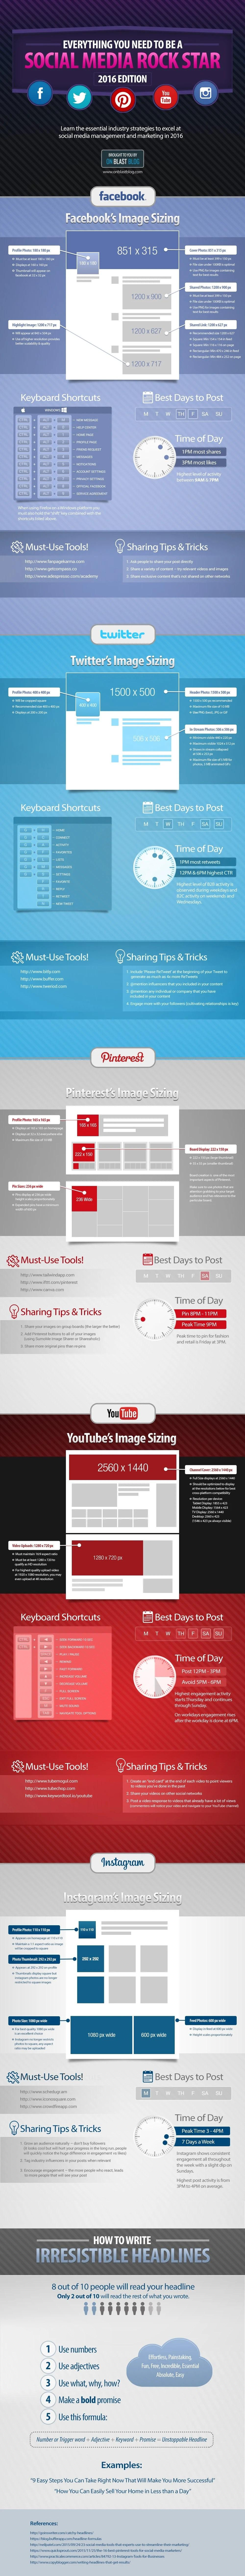 Social-Media-Image-Sizing-Cheat-Sheet-5.jpg